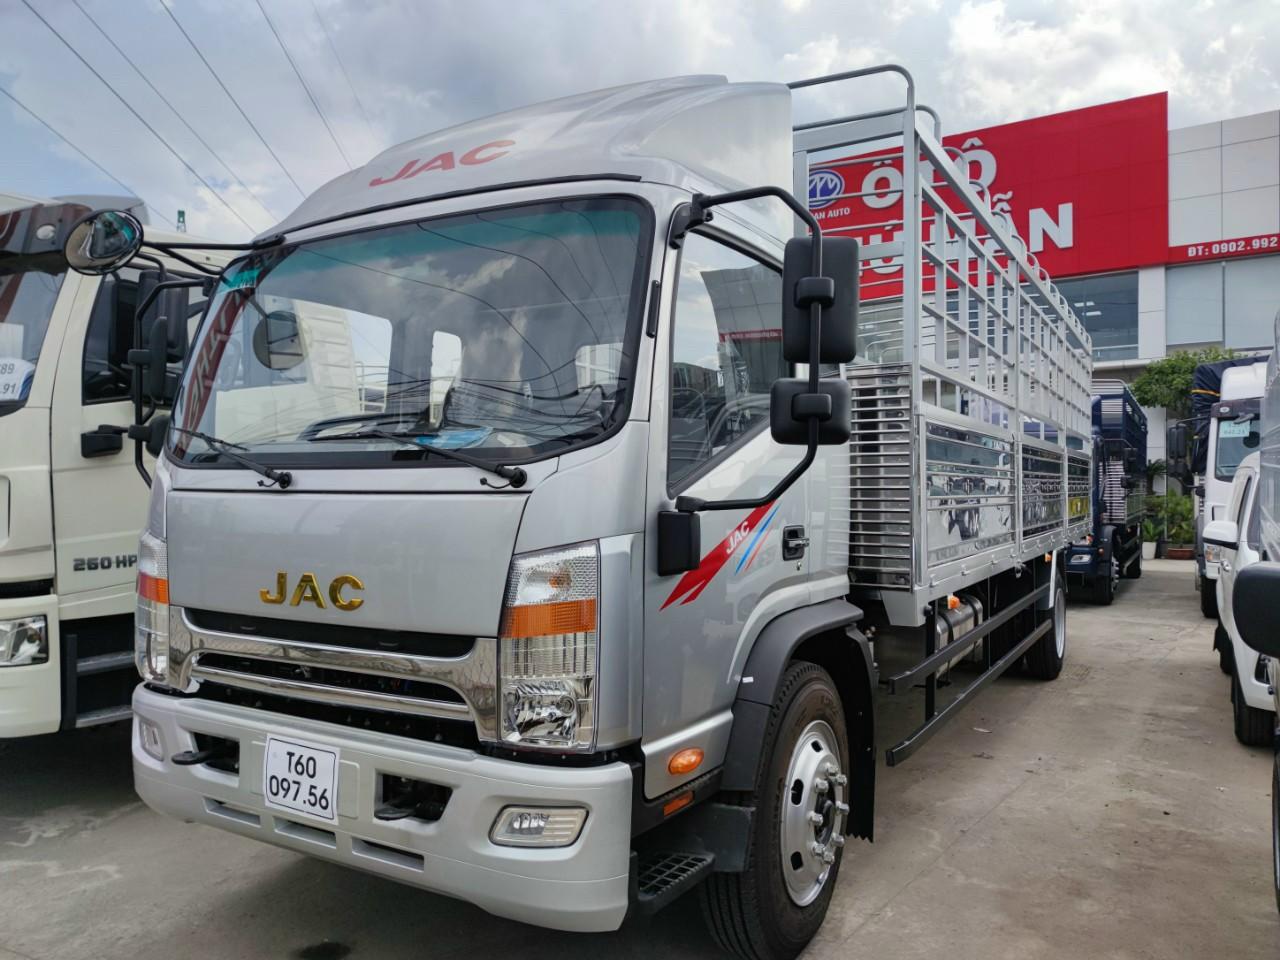 xe tải jac n800